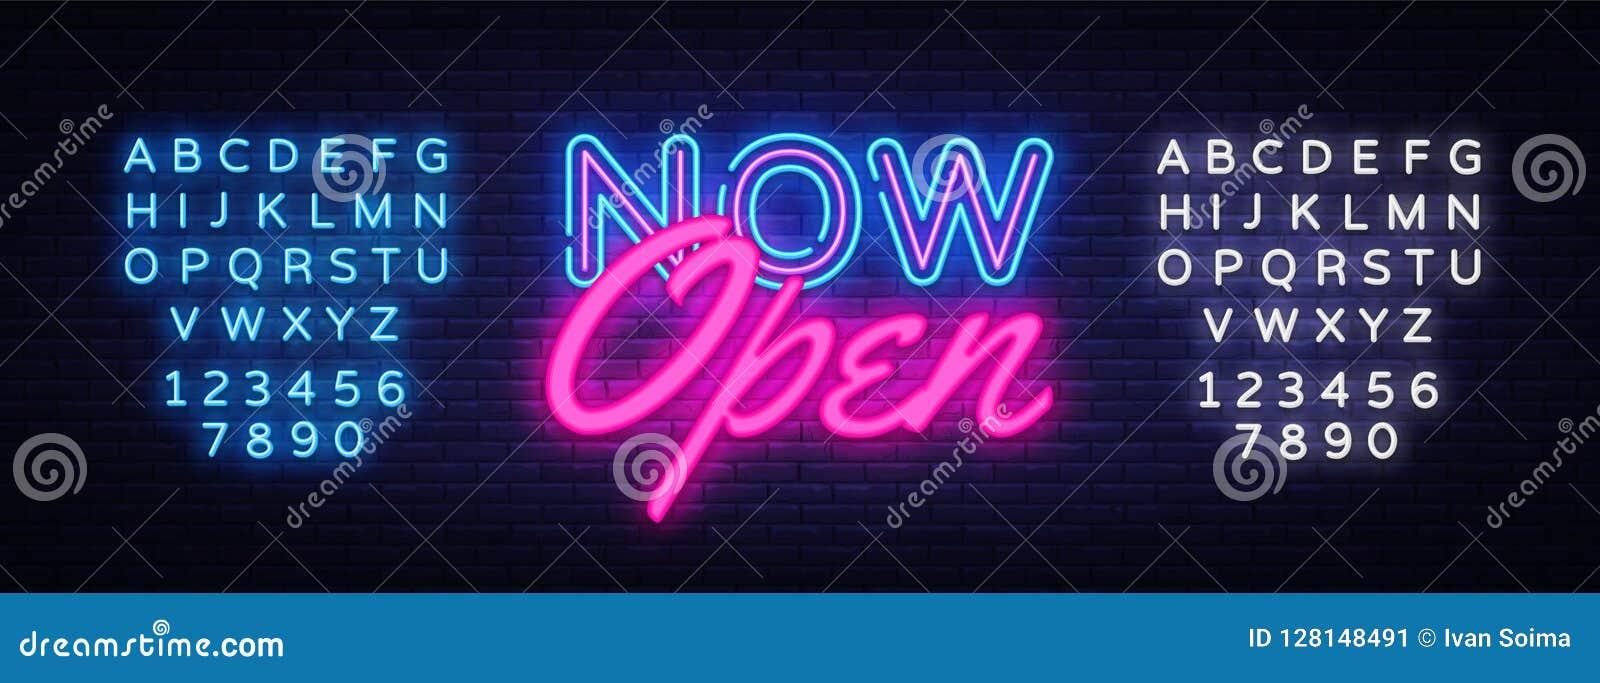 Molde de néon agora aberto do projeto do vetor do texto Logotipo de néon agora aberto, tendência colorida do projeto moderno do e